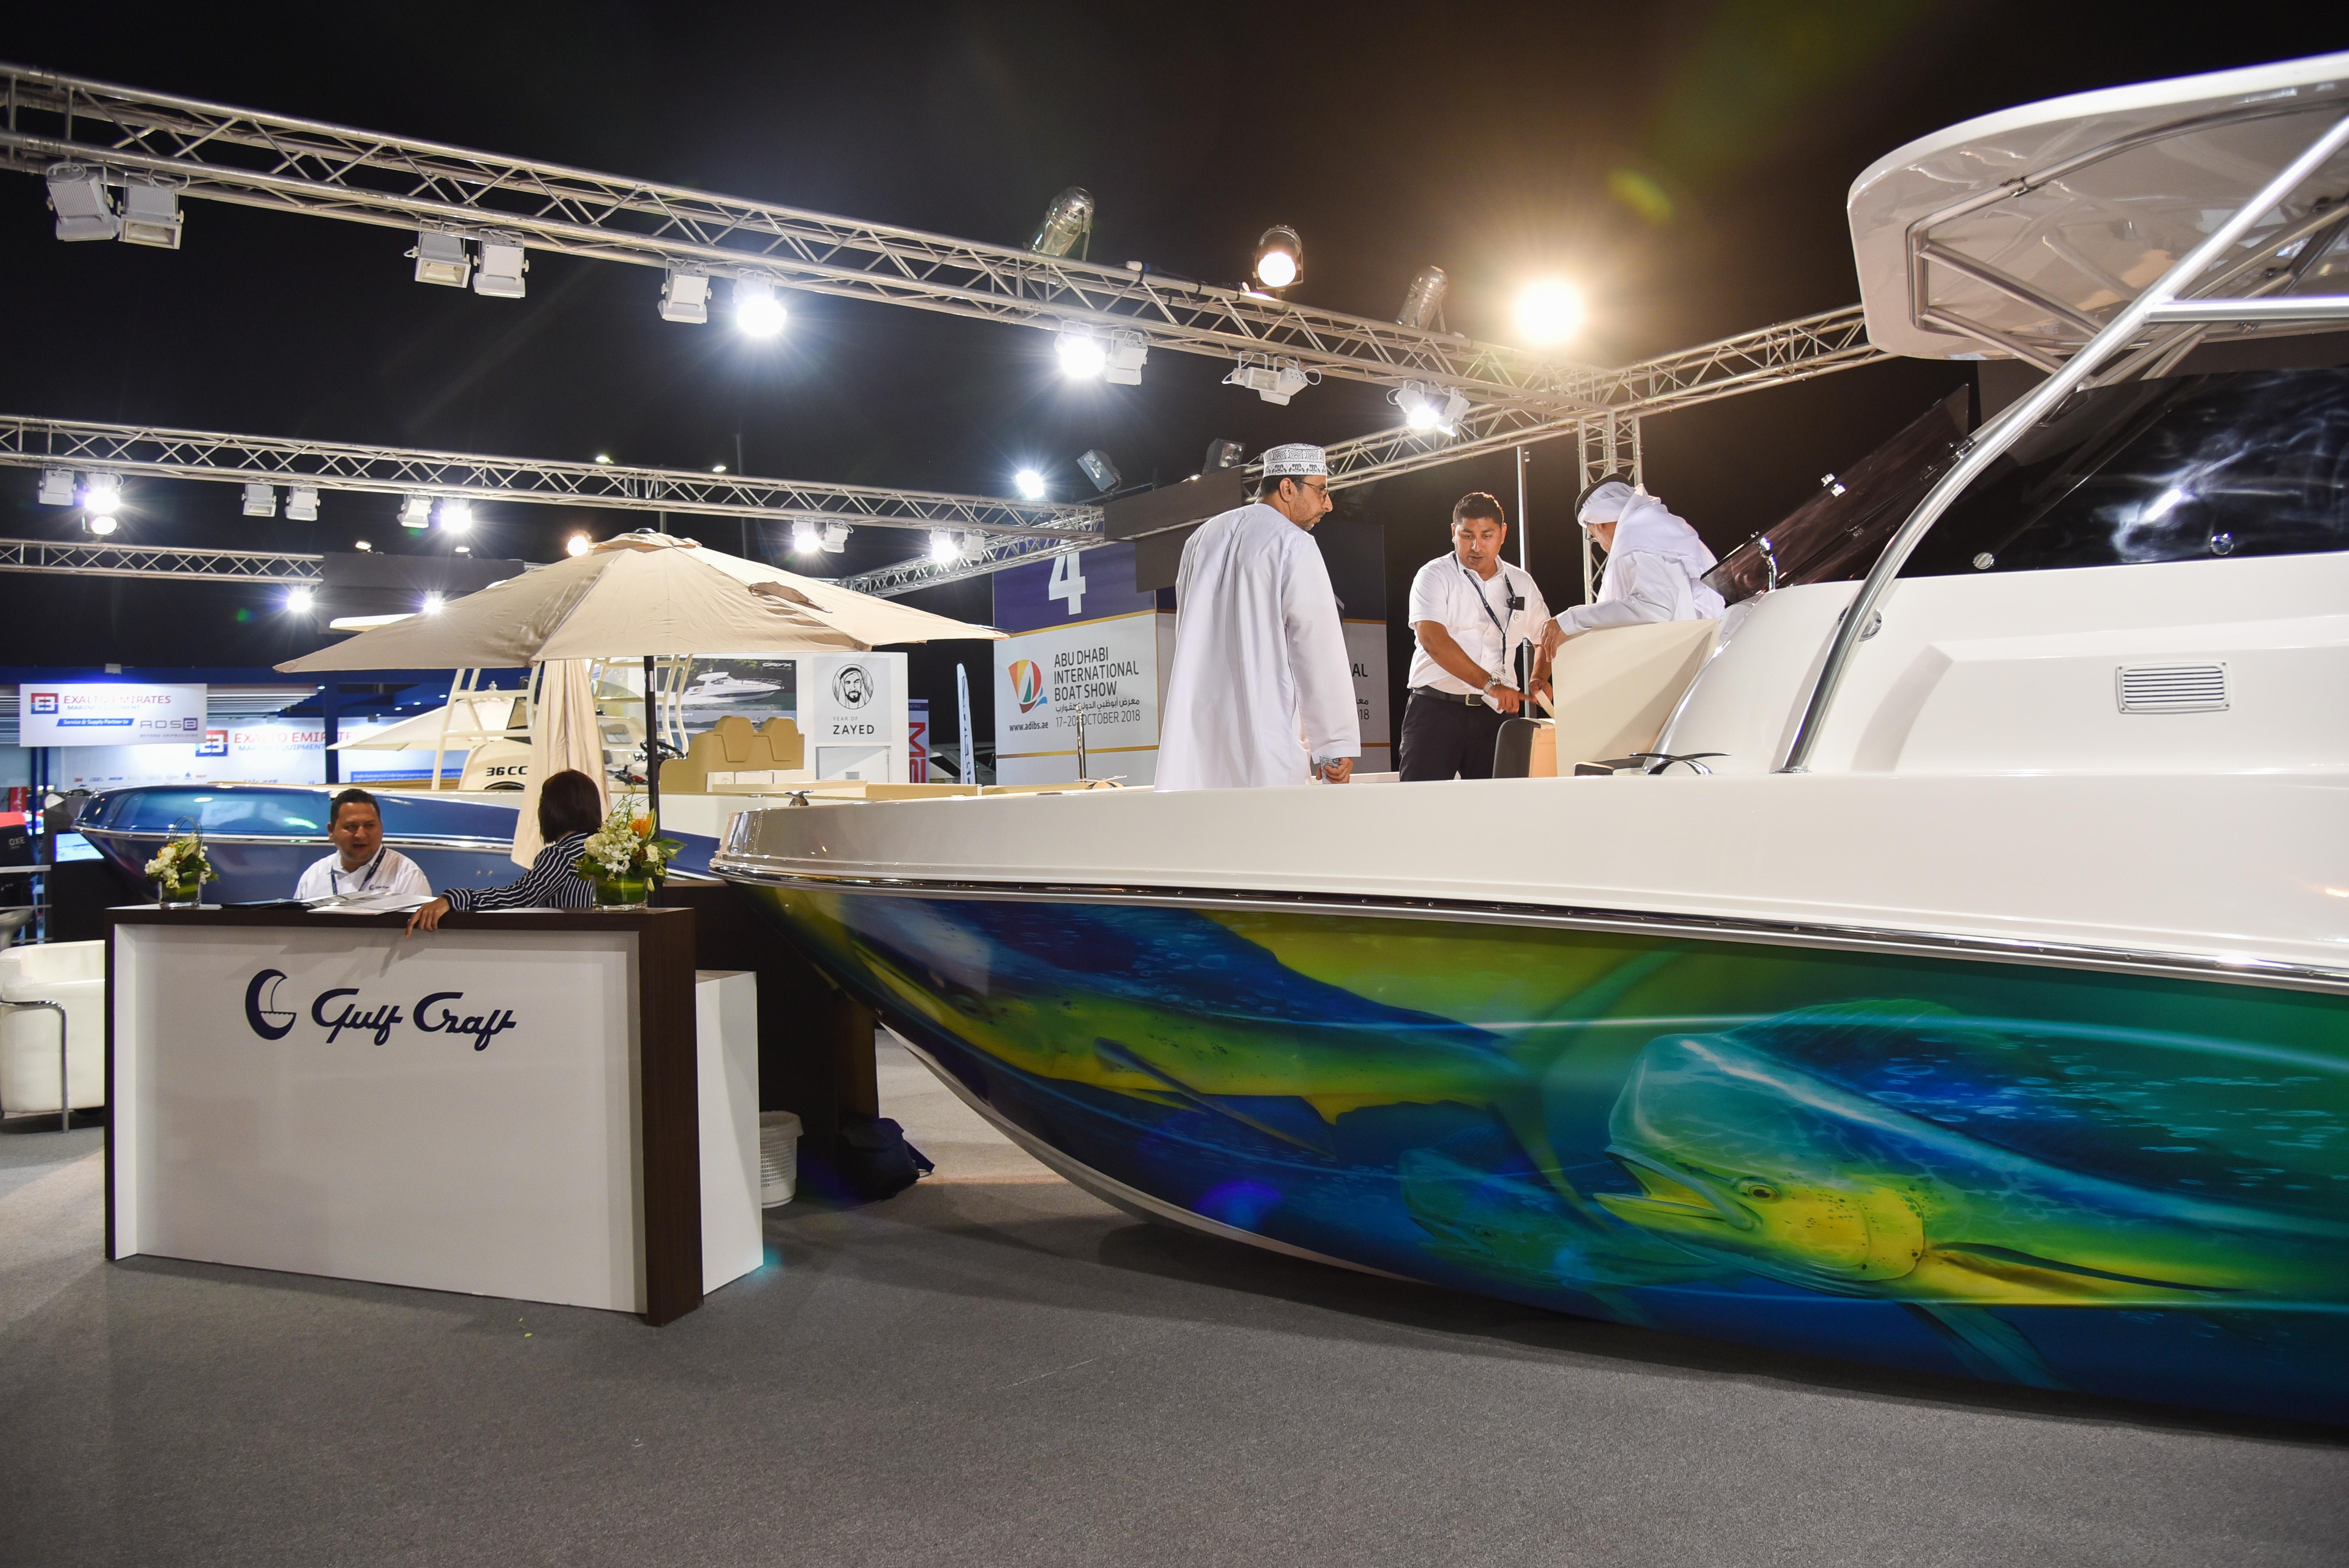 Gulf Craft at Abu Dhabi Boat Show 2018 Day 2(21).jpg